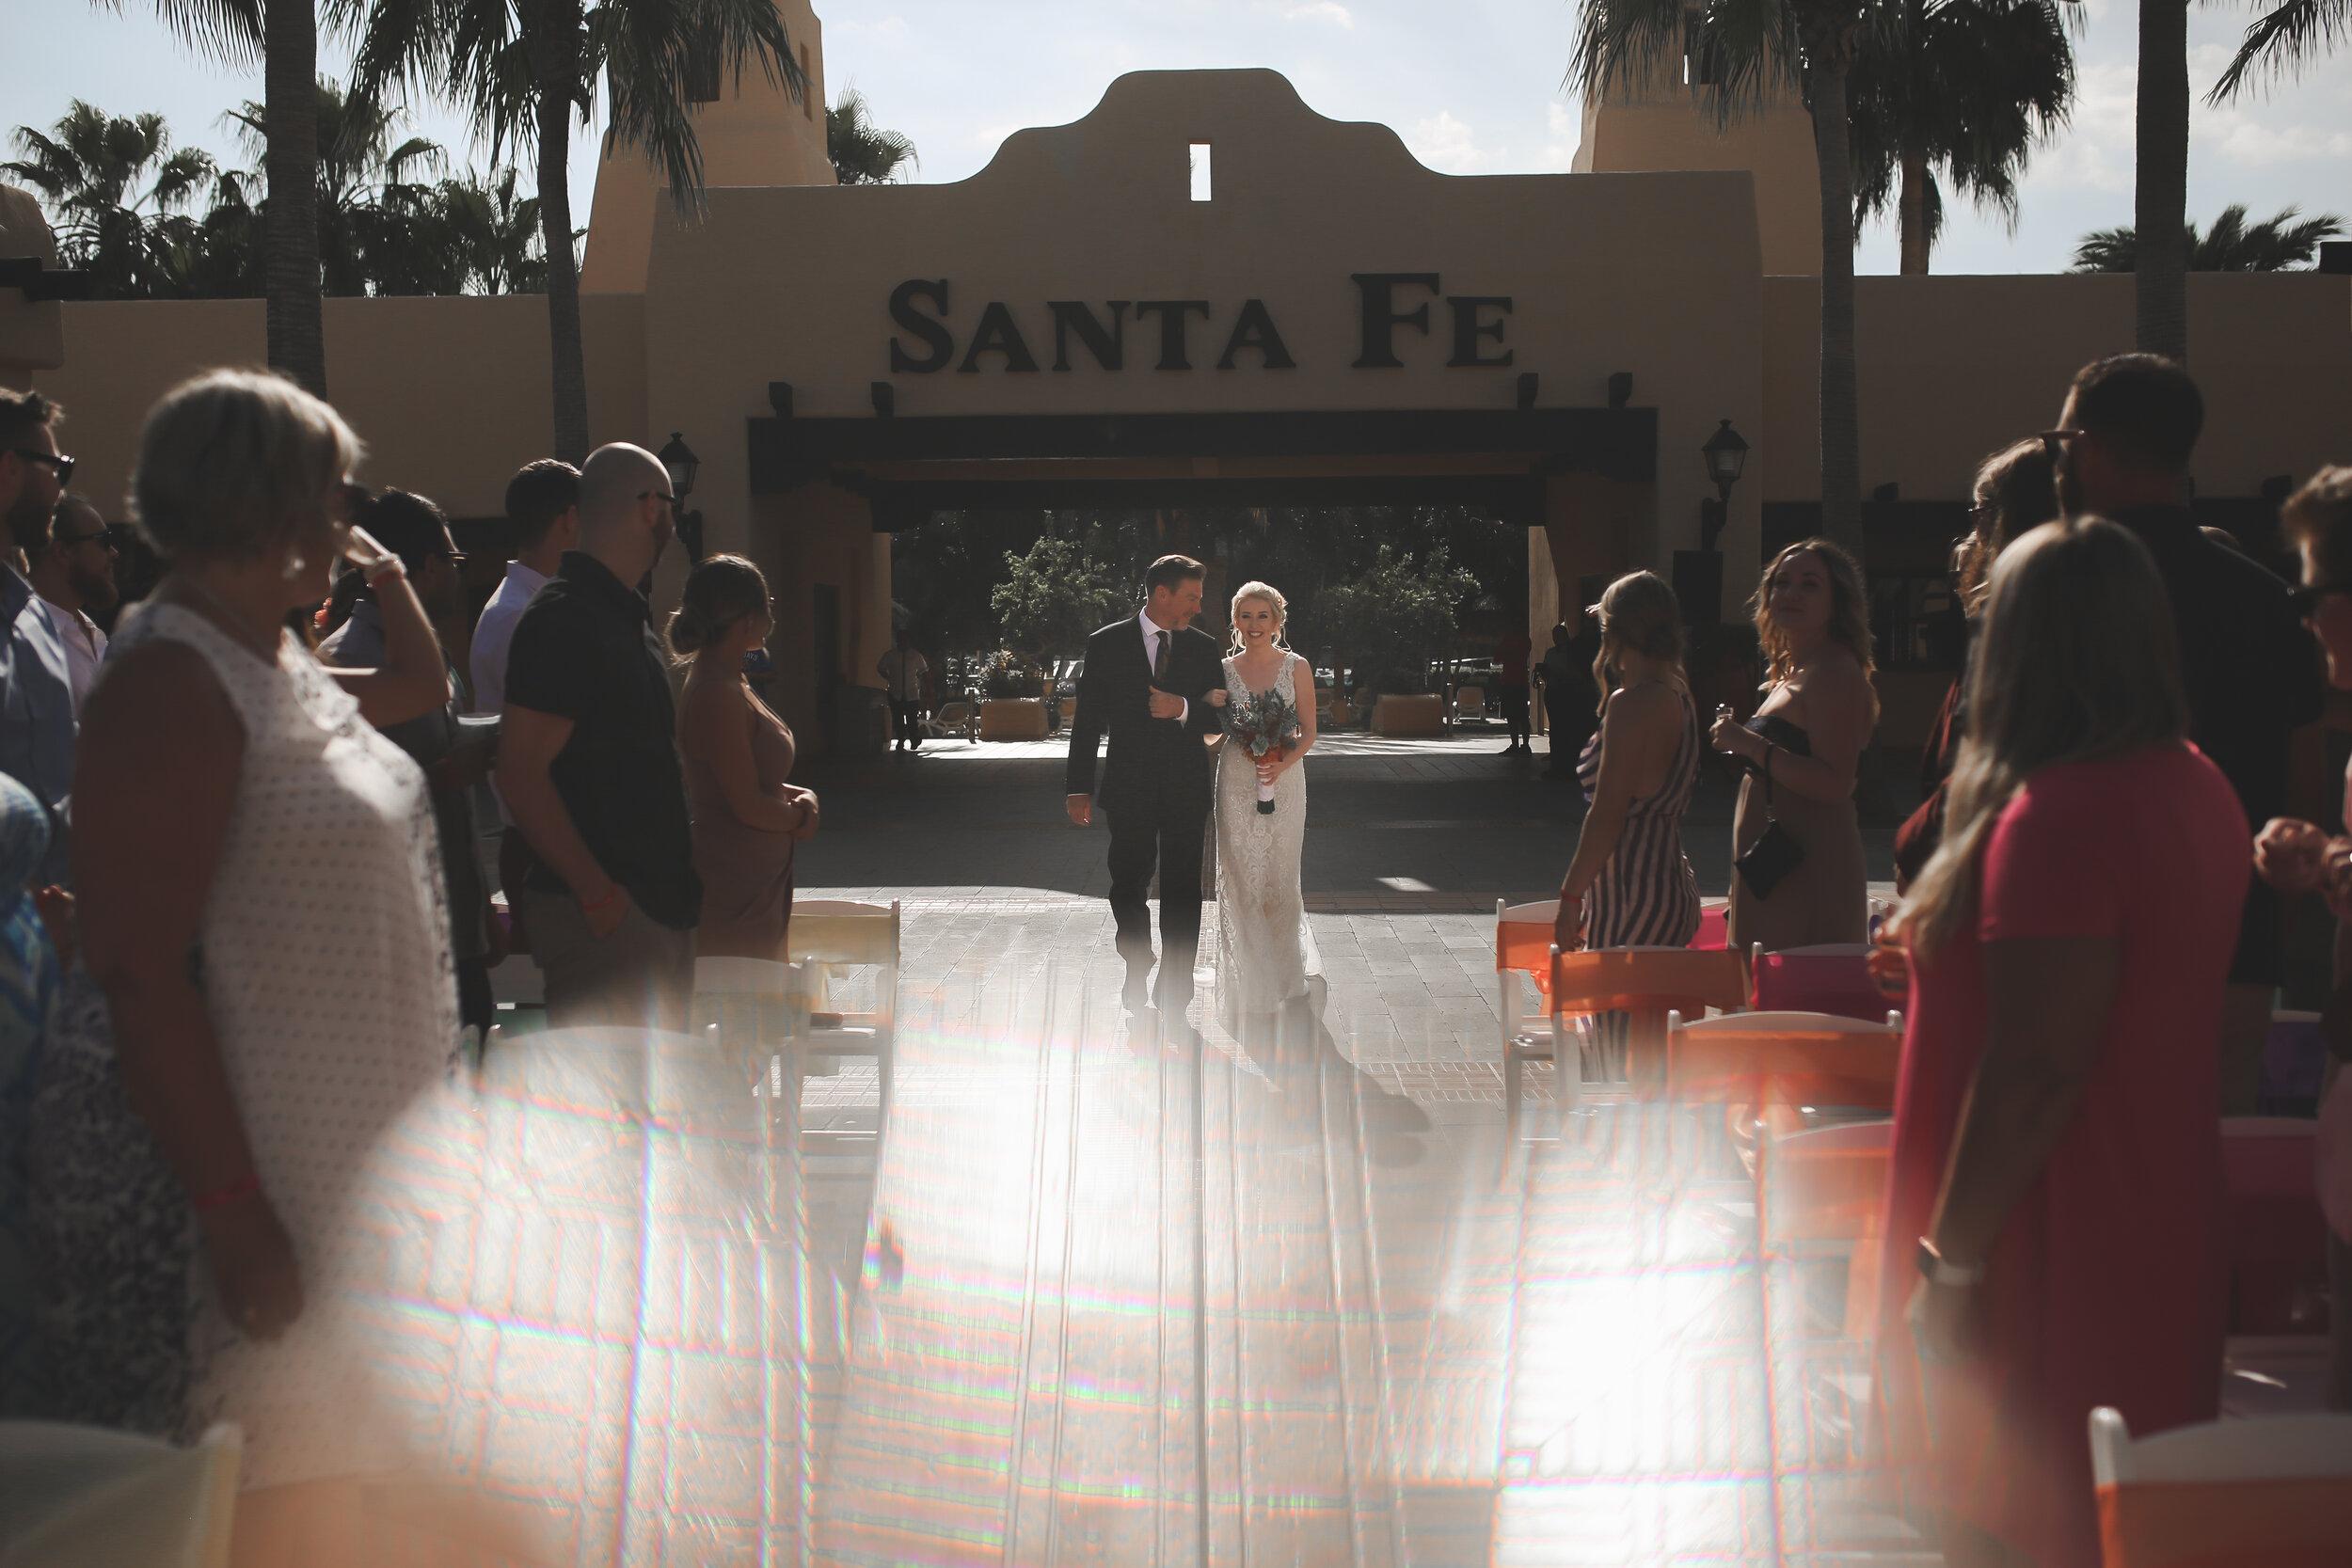 154-Adam-Ziorio-Photography-VictoriaBC-Weddings&Elopements.jpg